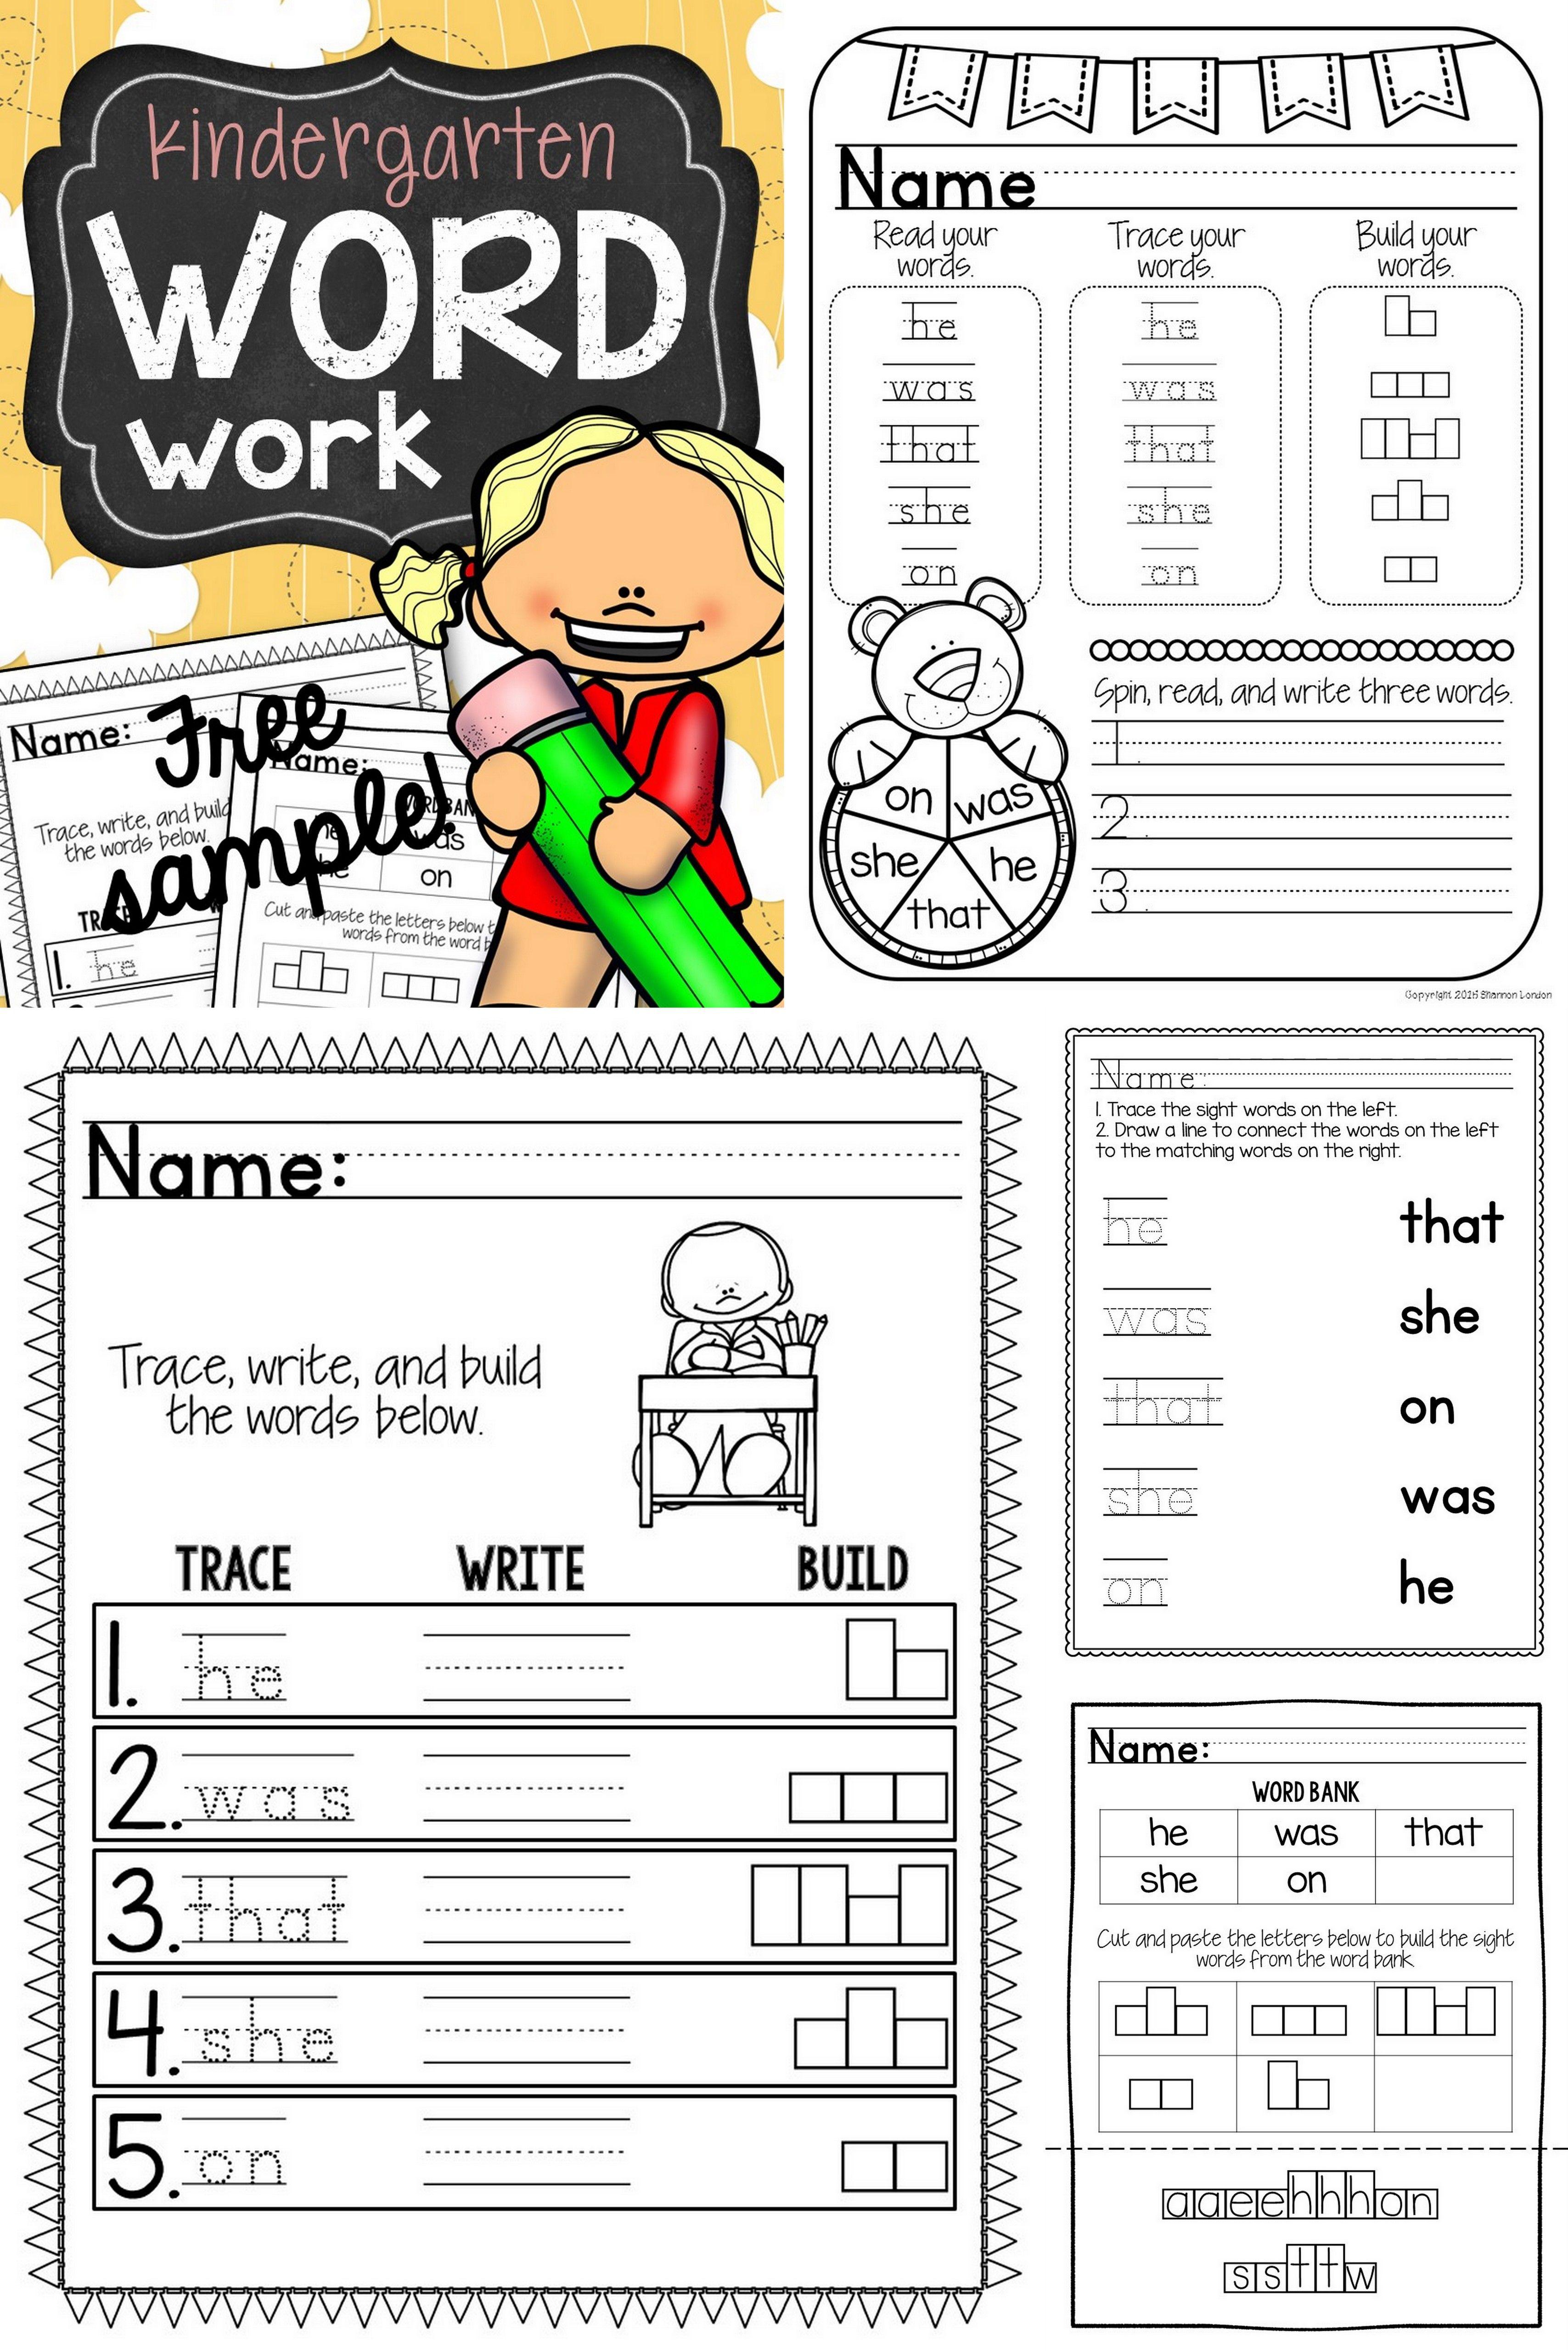 Free Kindergarten Word Work